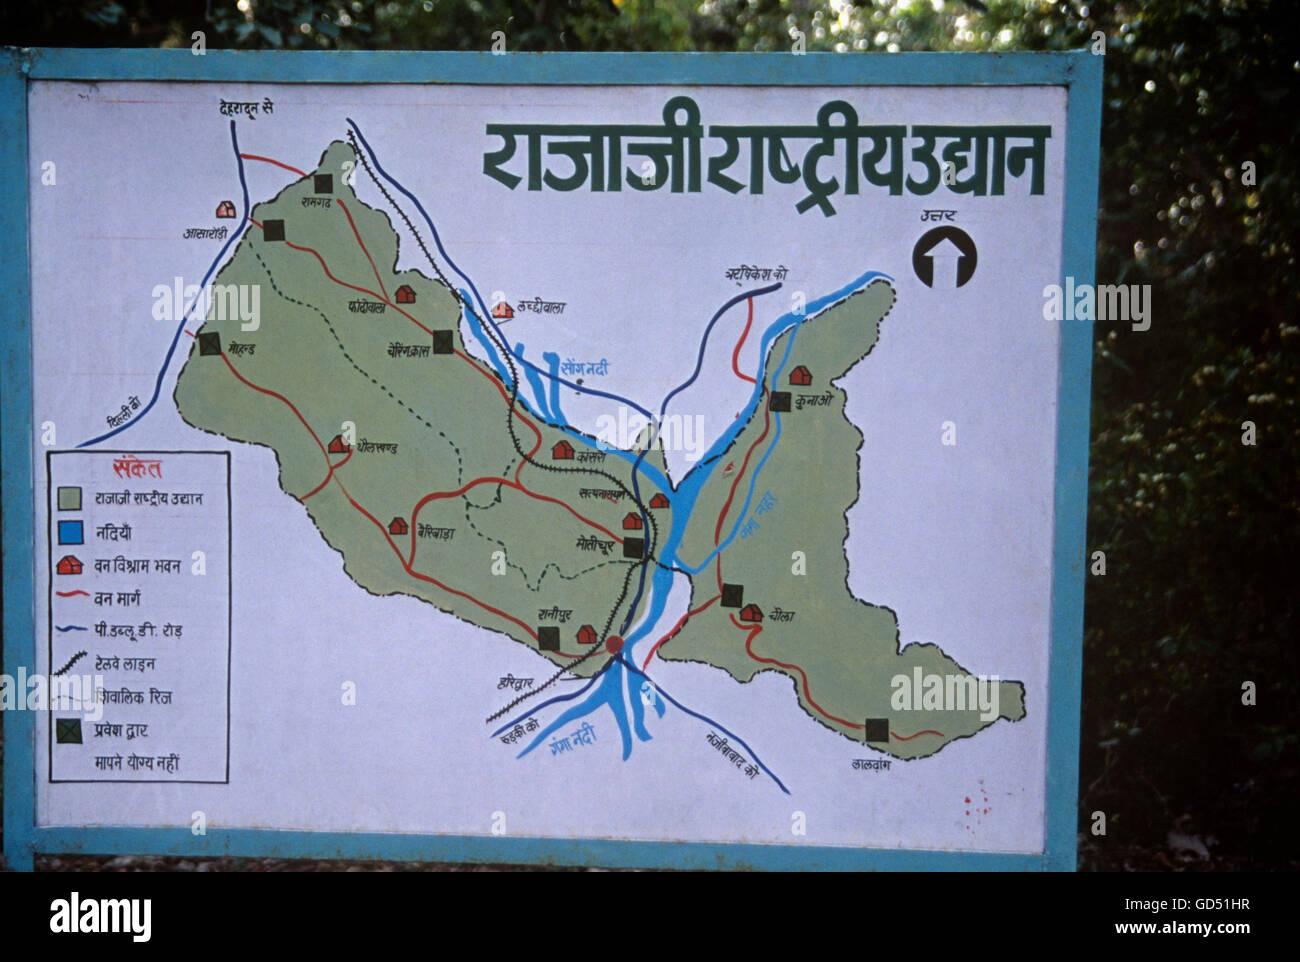 Uttaranchal Map Stock Photos & Uttaranchal Map Stock Images - Alamy